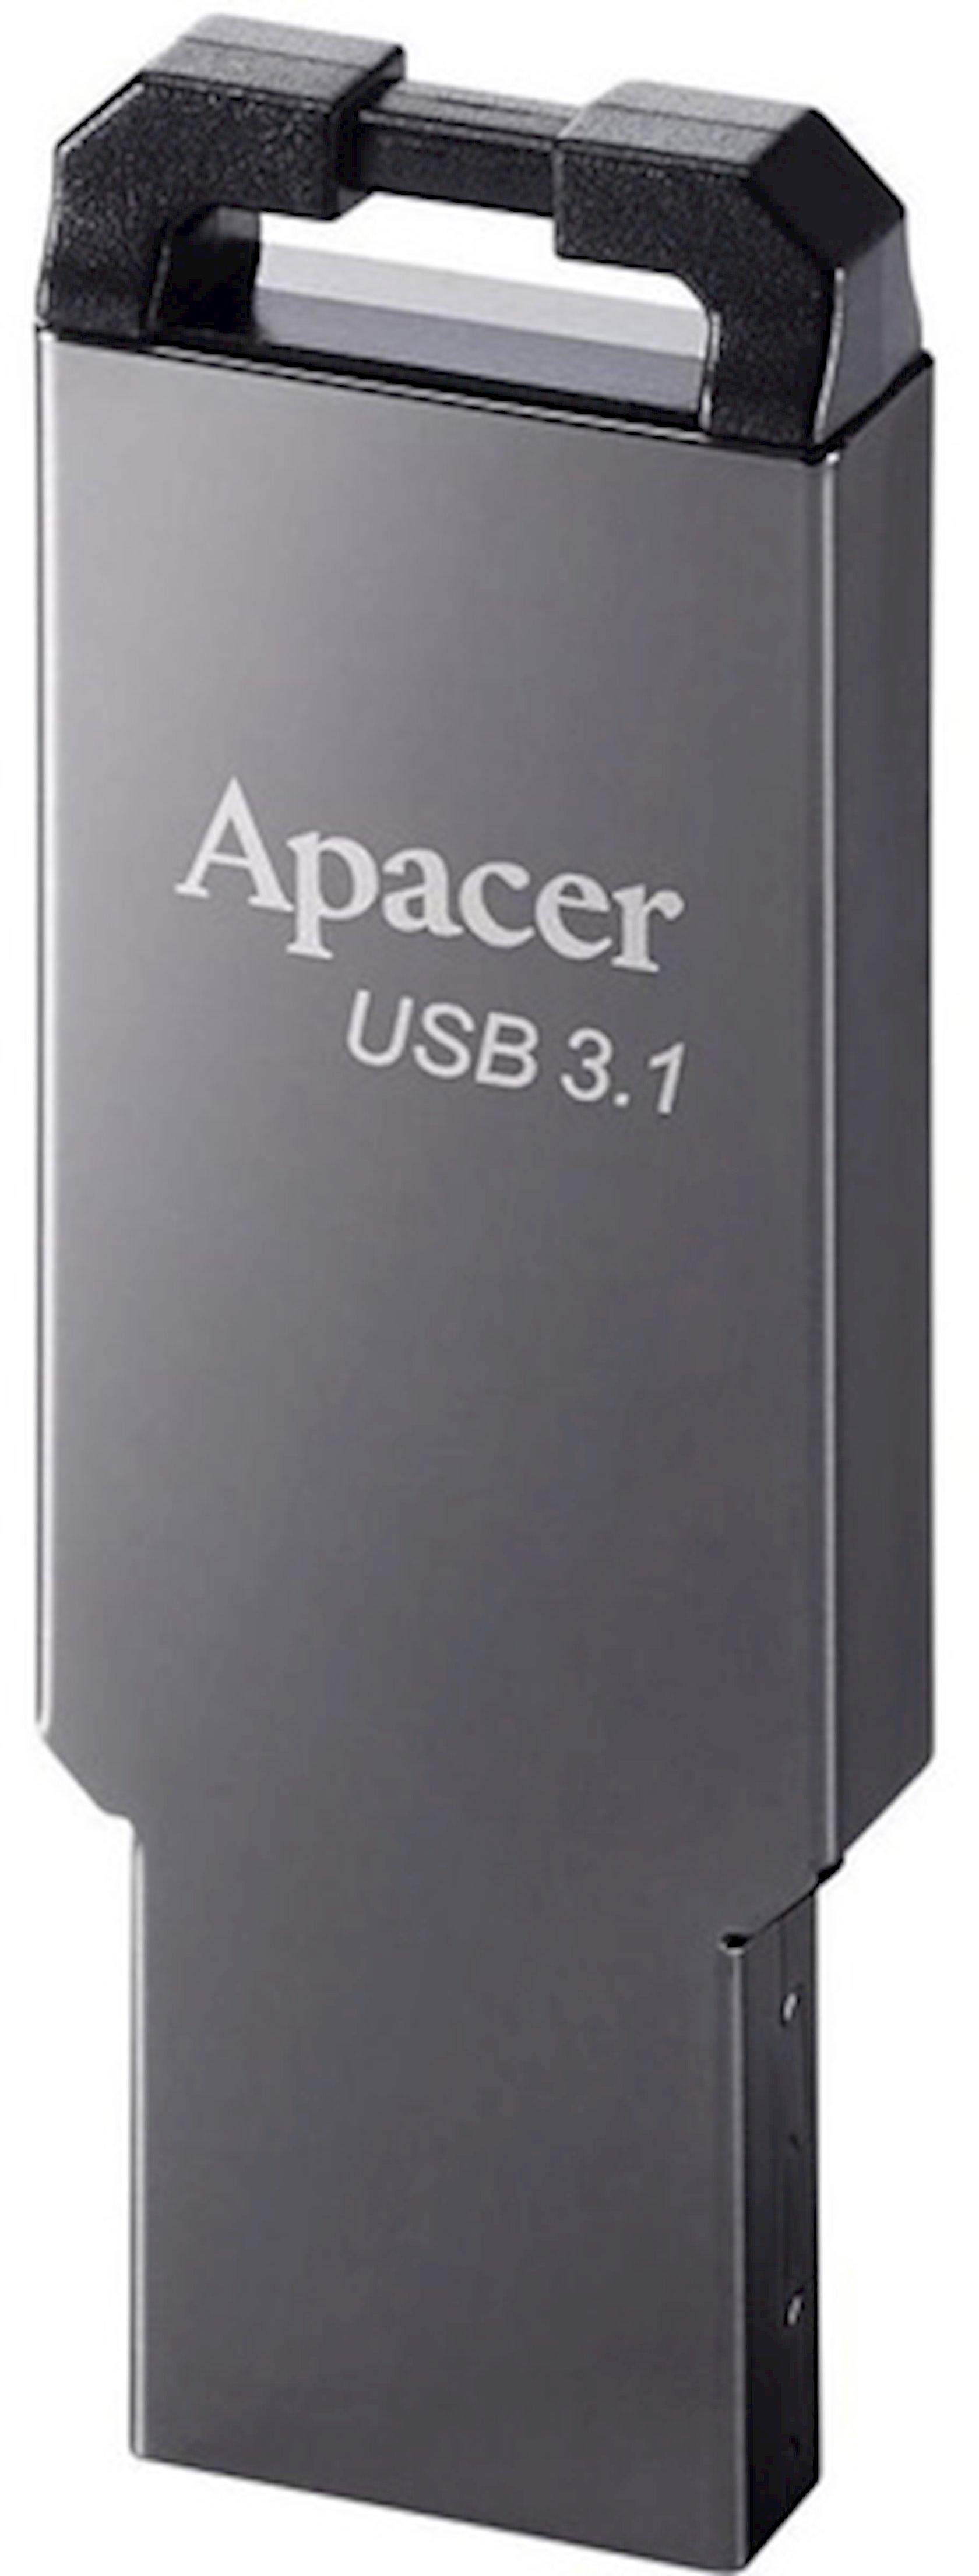 Fleş kart Apacer 16GB USB 3.1 AH360 Ashy